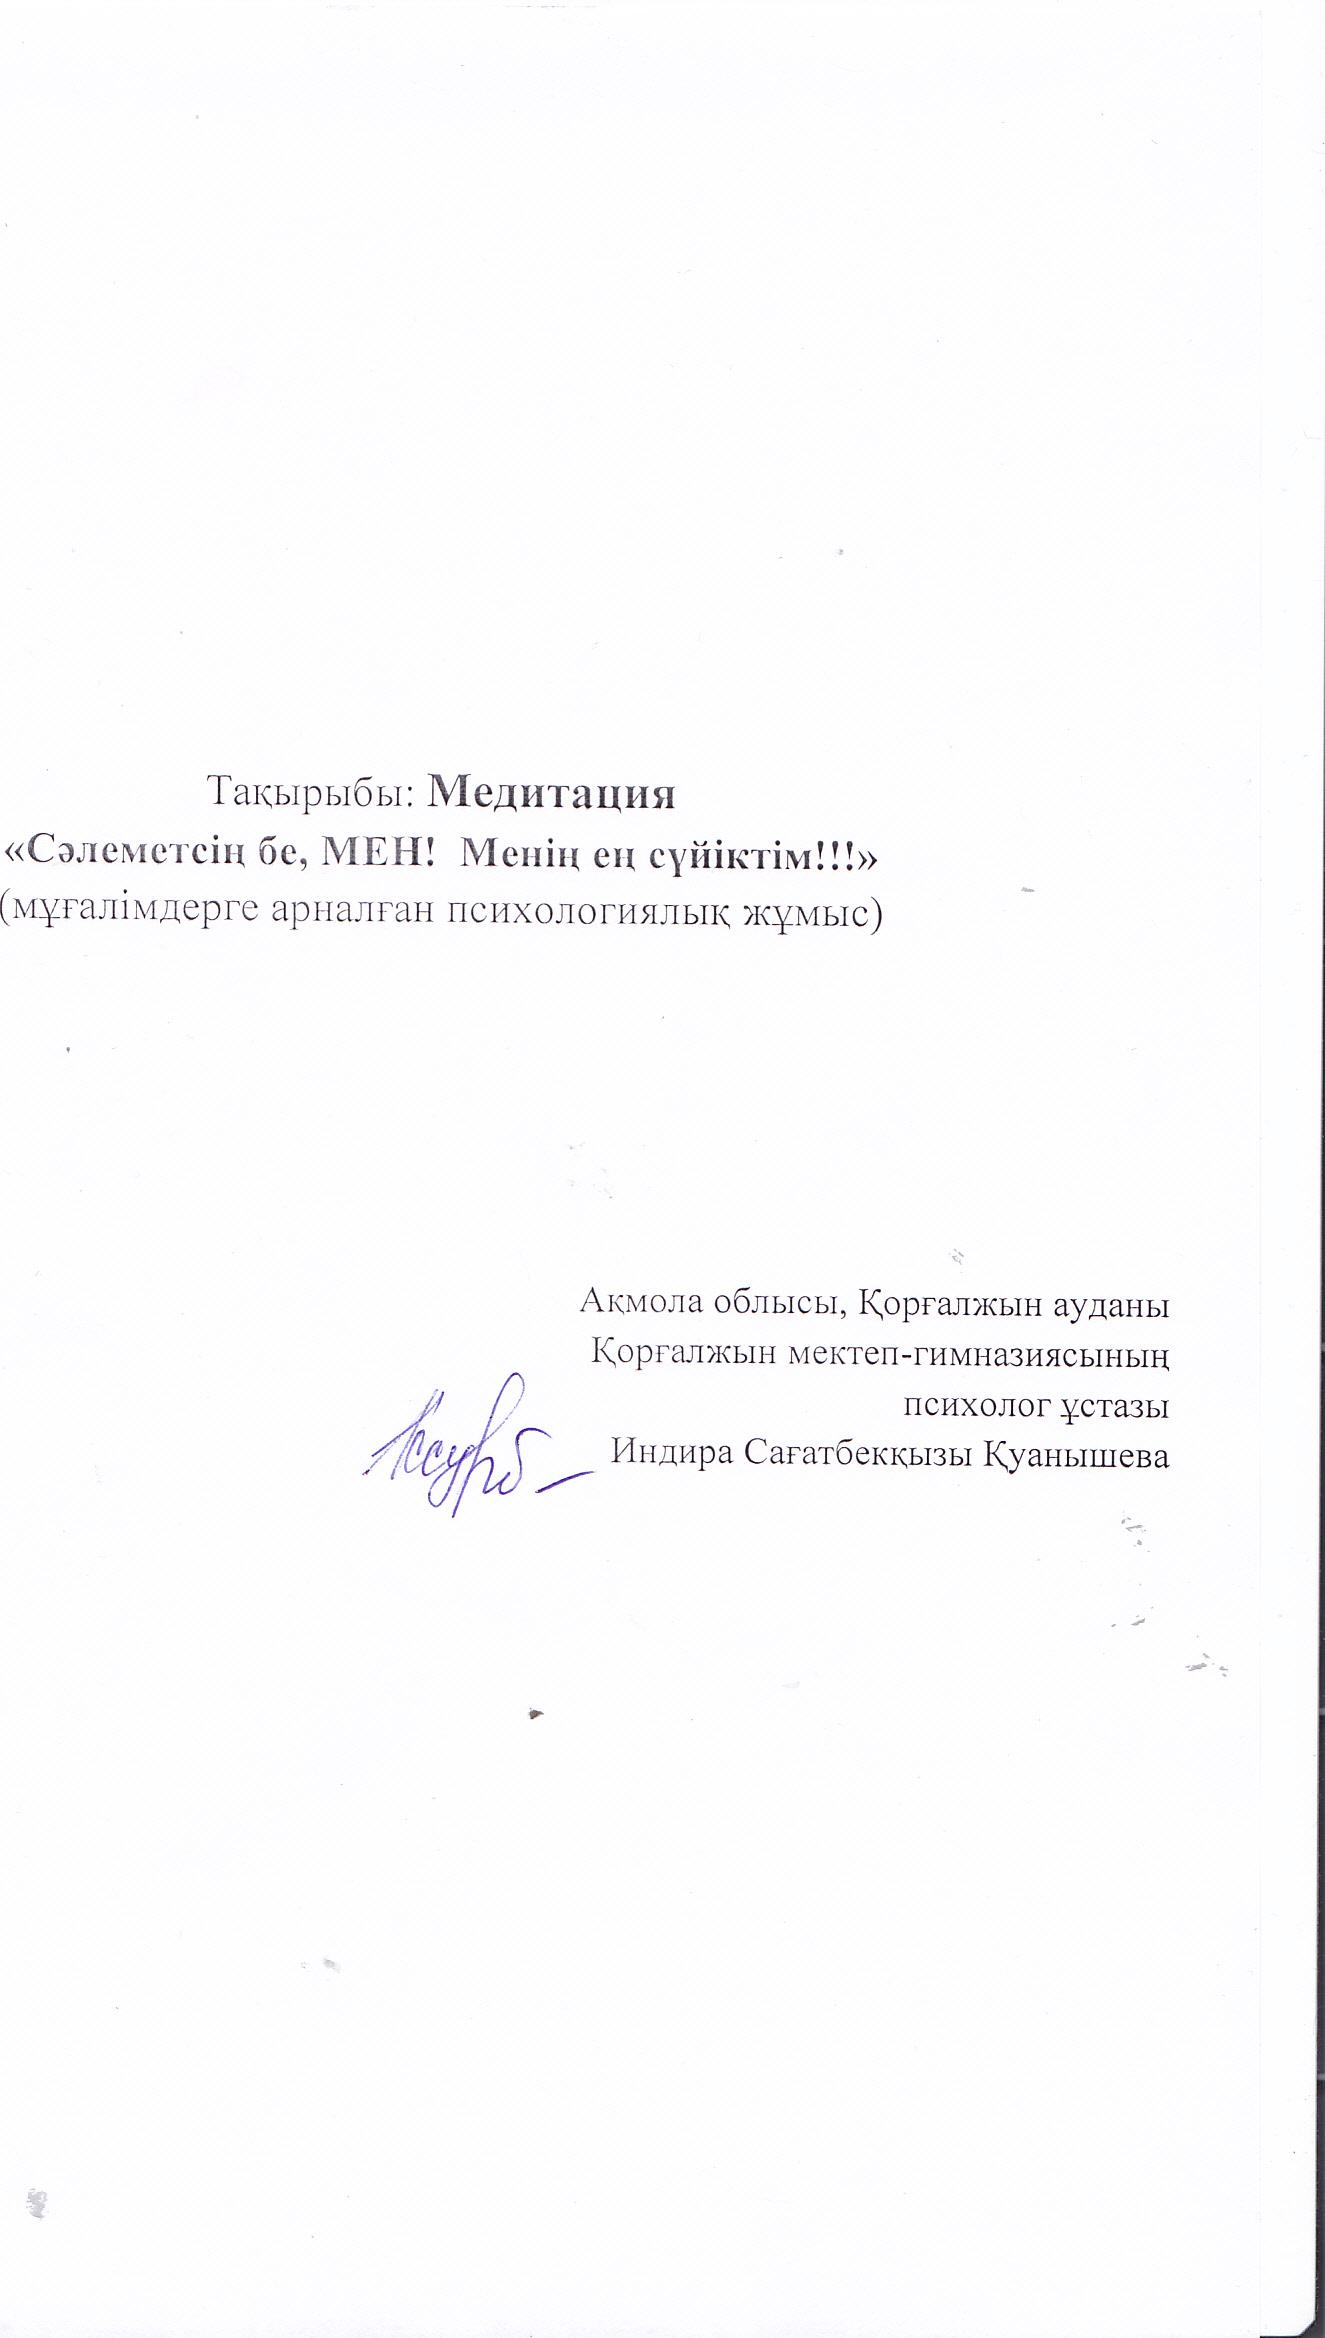 C:\Documents and Settings\Admin\Рабочий стол\2015_02_26\IMG.jpg